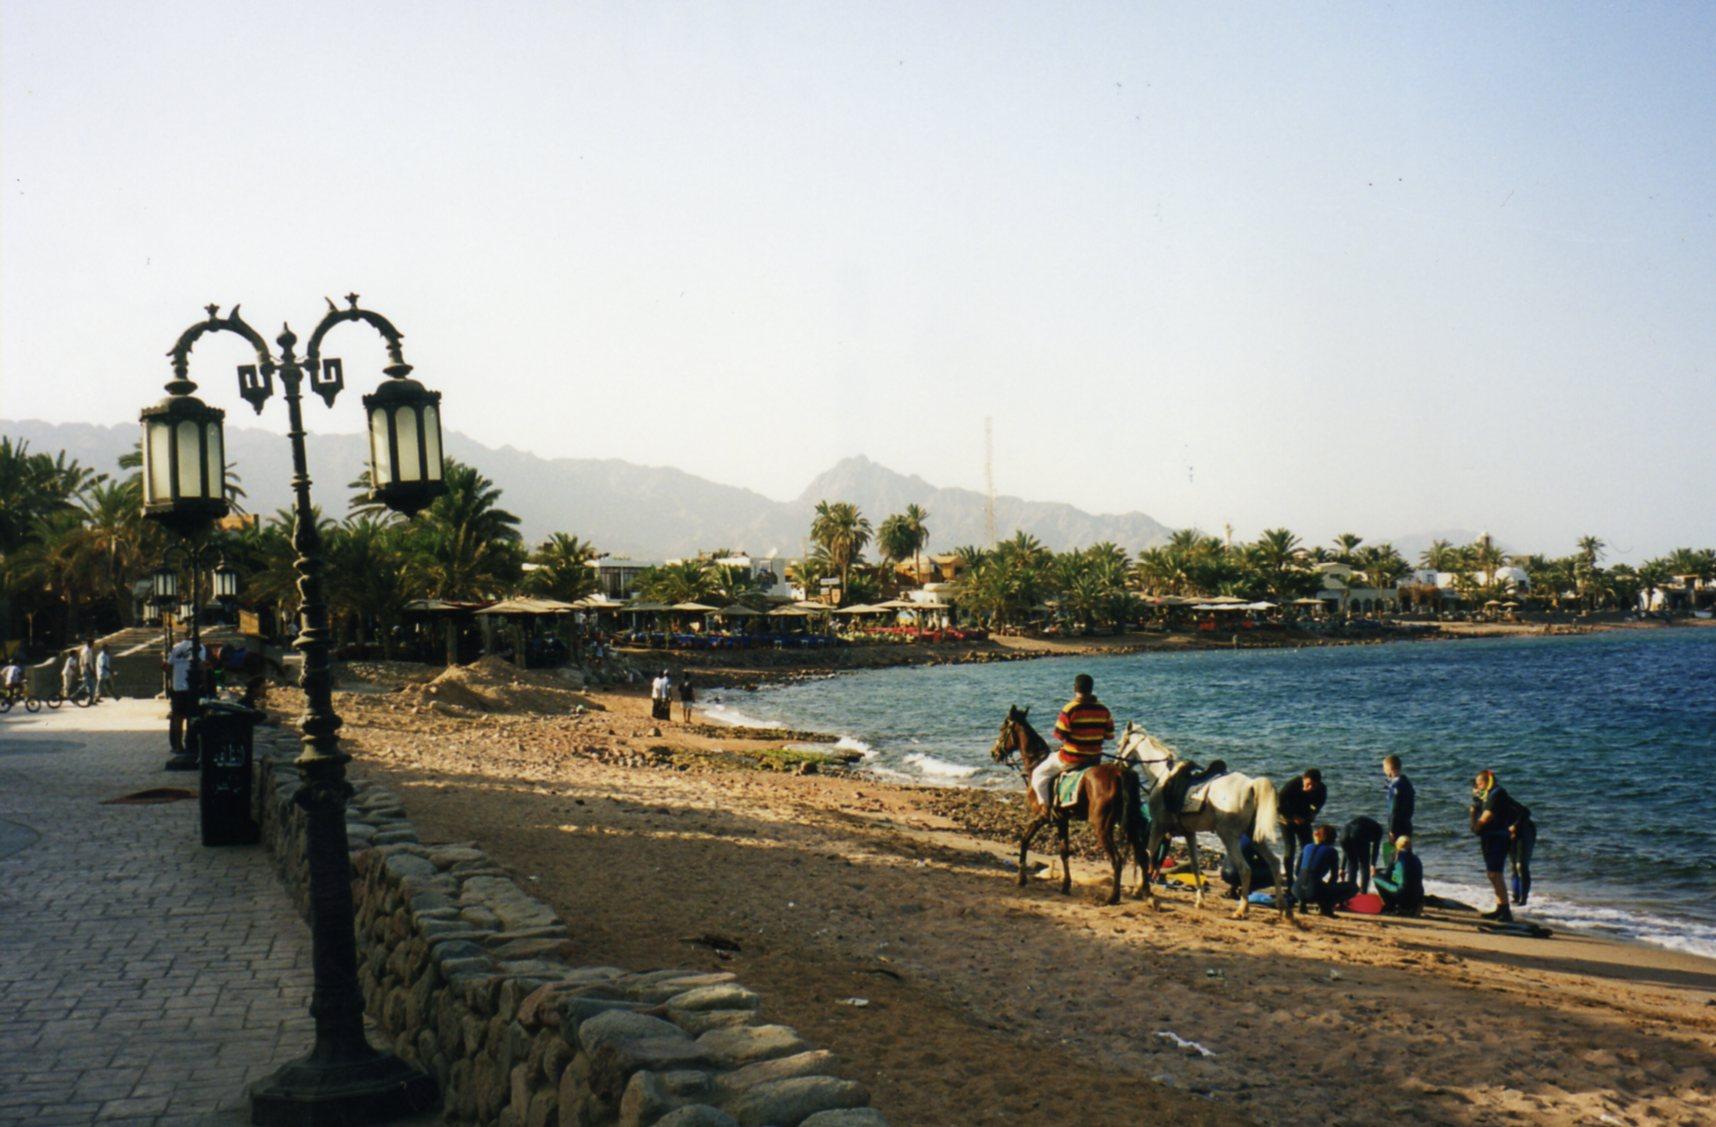 The bay & 'Beach' at Dahab